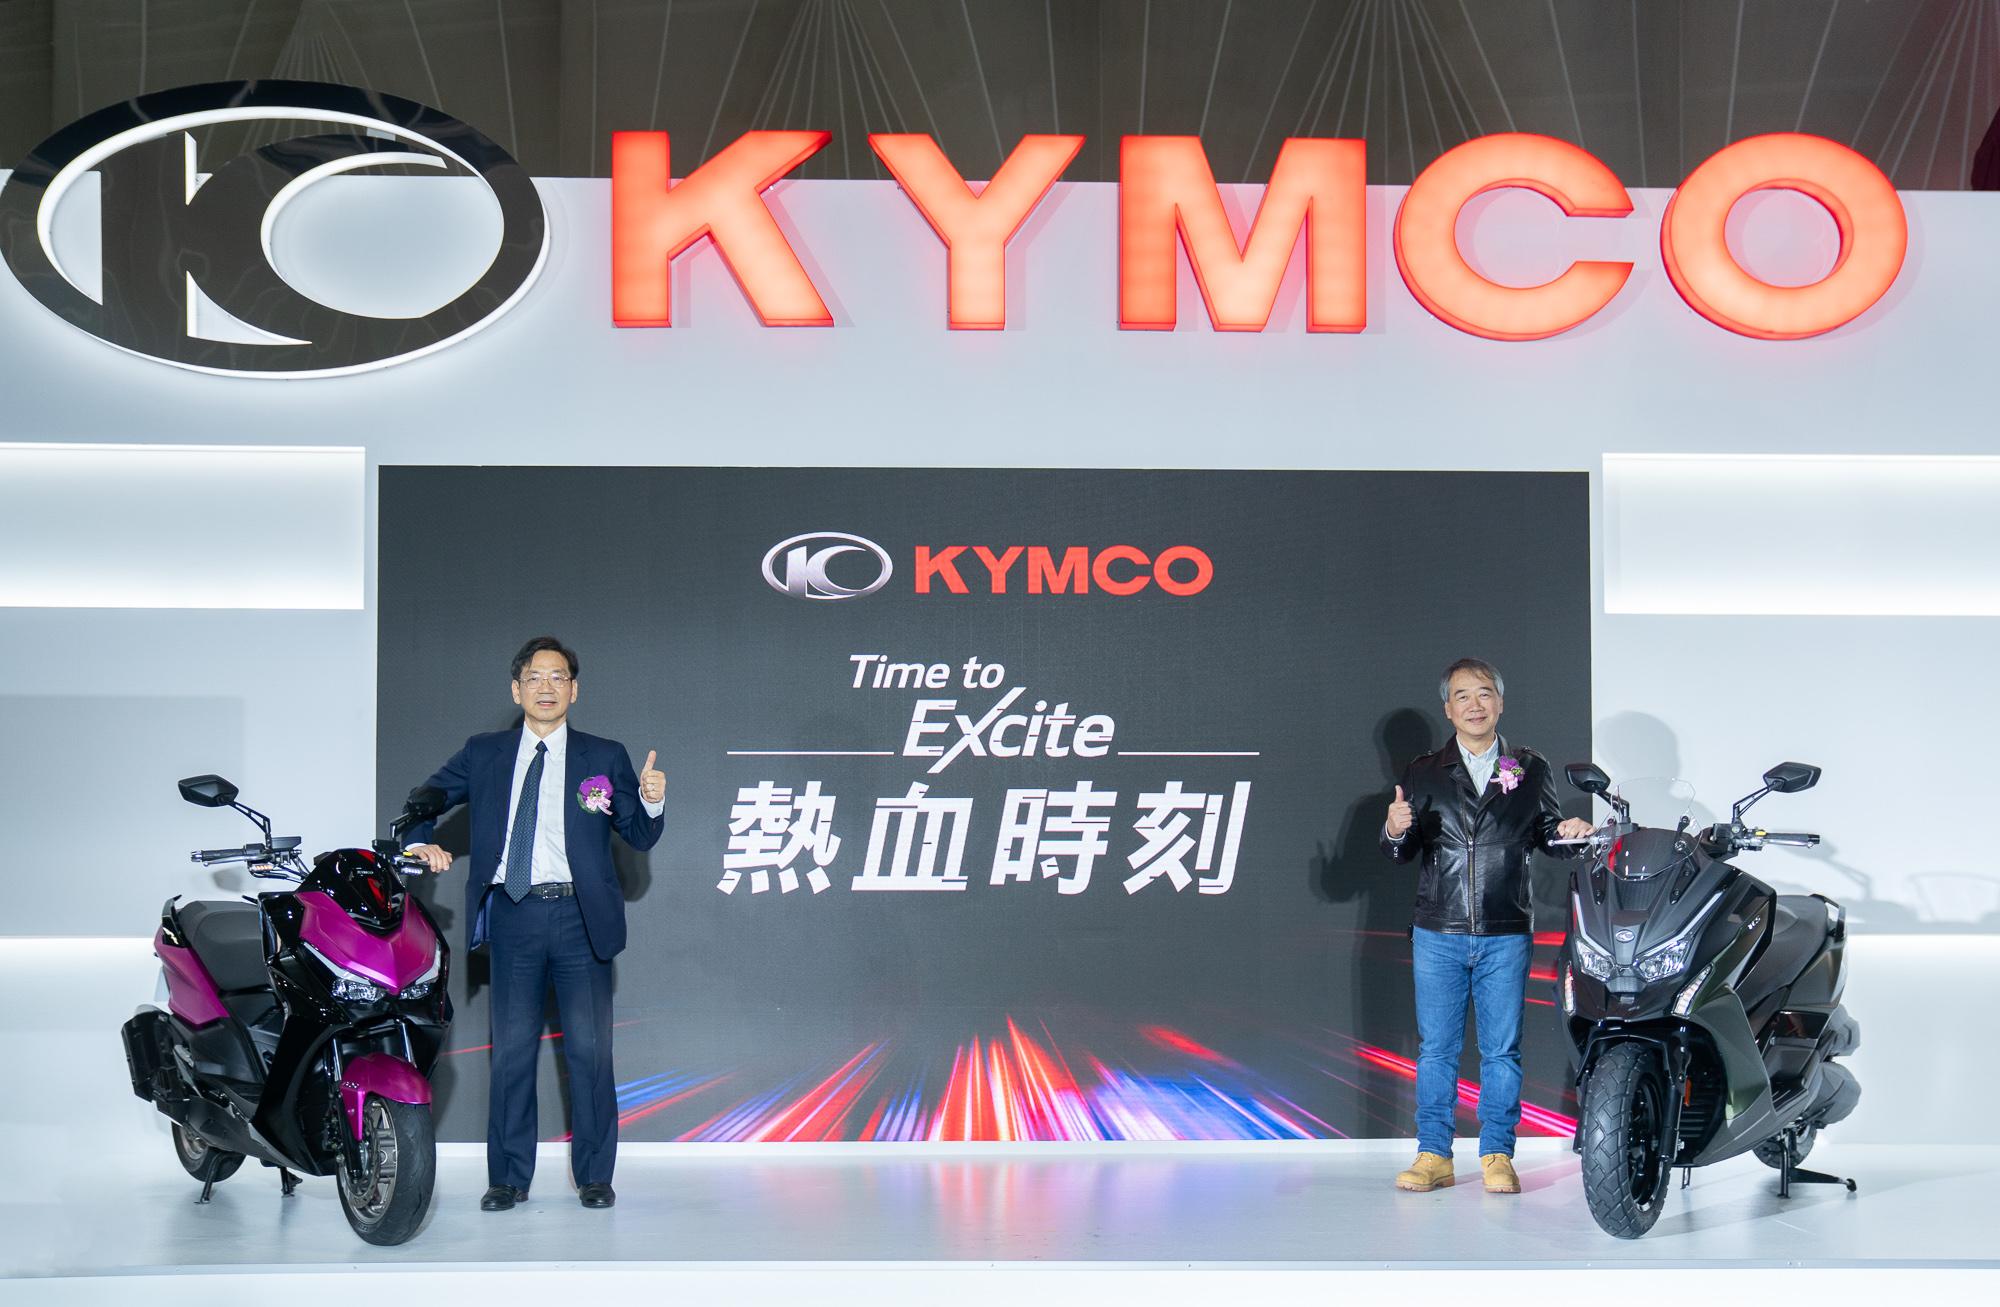 Kymco 執行長柯俊斌、 營業部黃俊平經理正式公佈 DT X360 官方售價,同時宣布 KRV 全省試乘活動即刻展開!